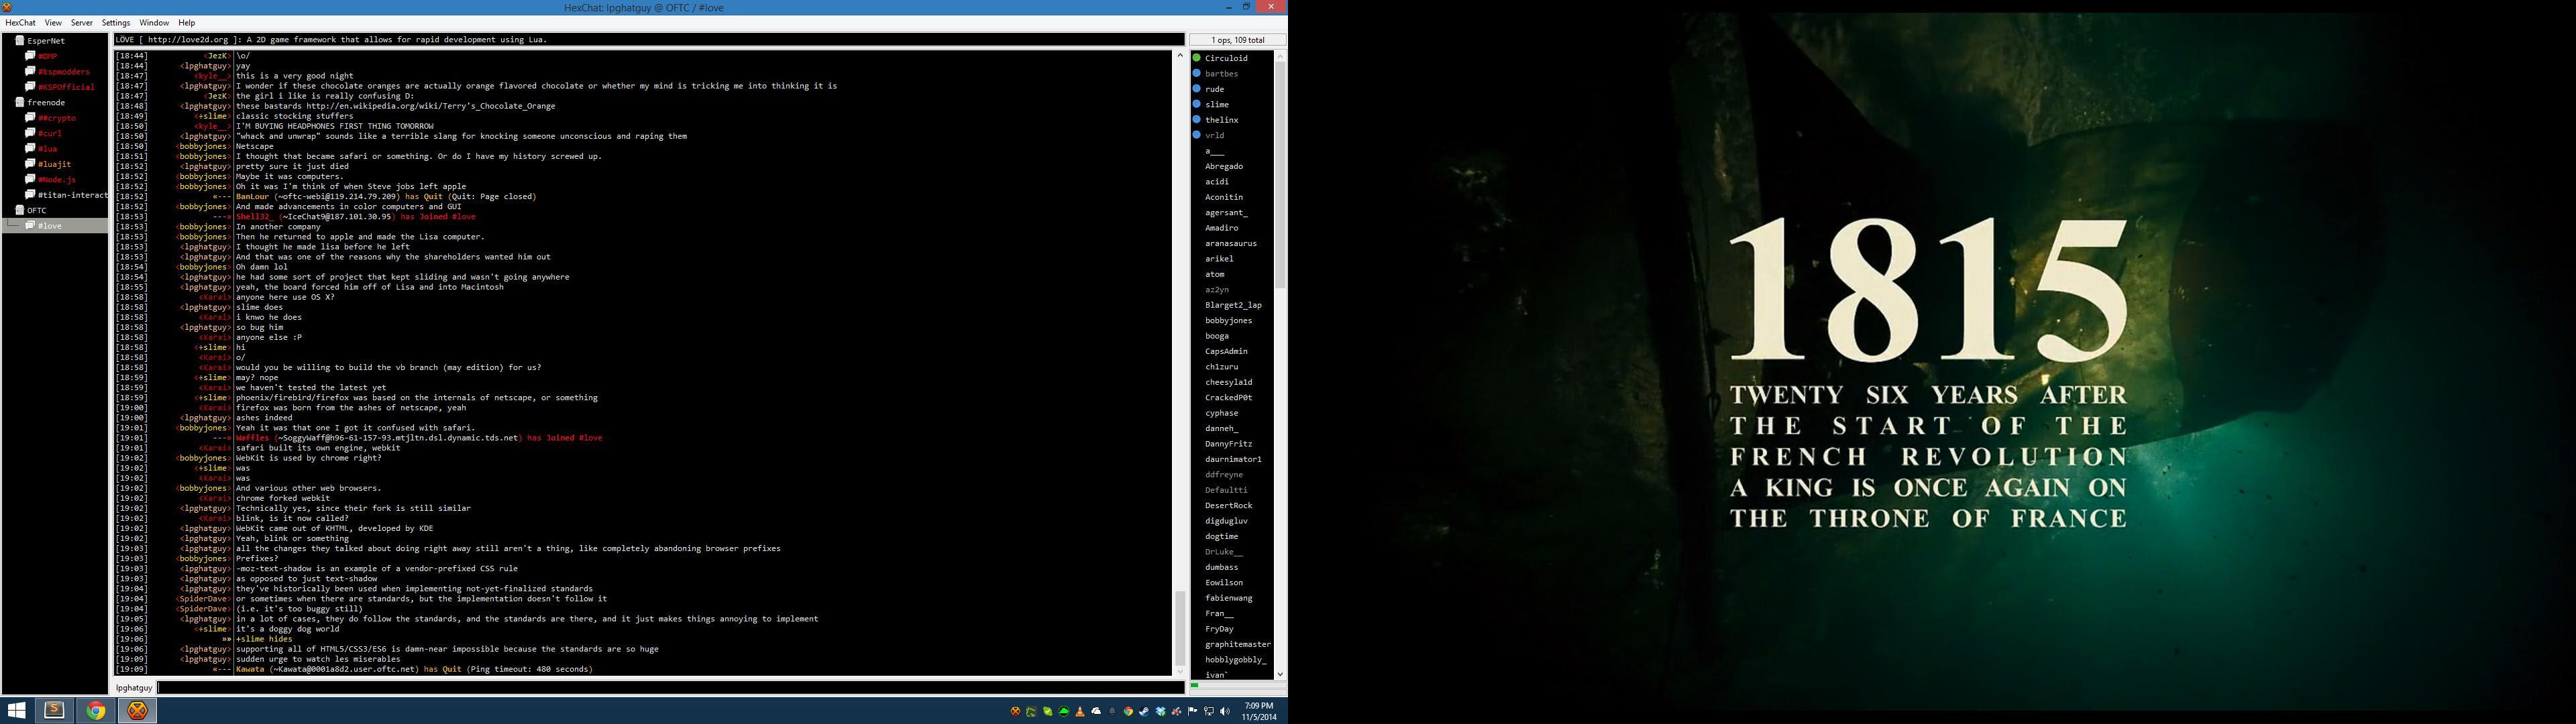 0001 Kawata Kawata At 0001a8d2useroftcnet Joined - classic roblox games reddit roblox quick asset downloader